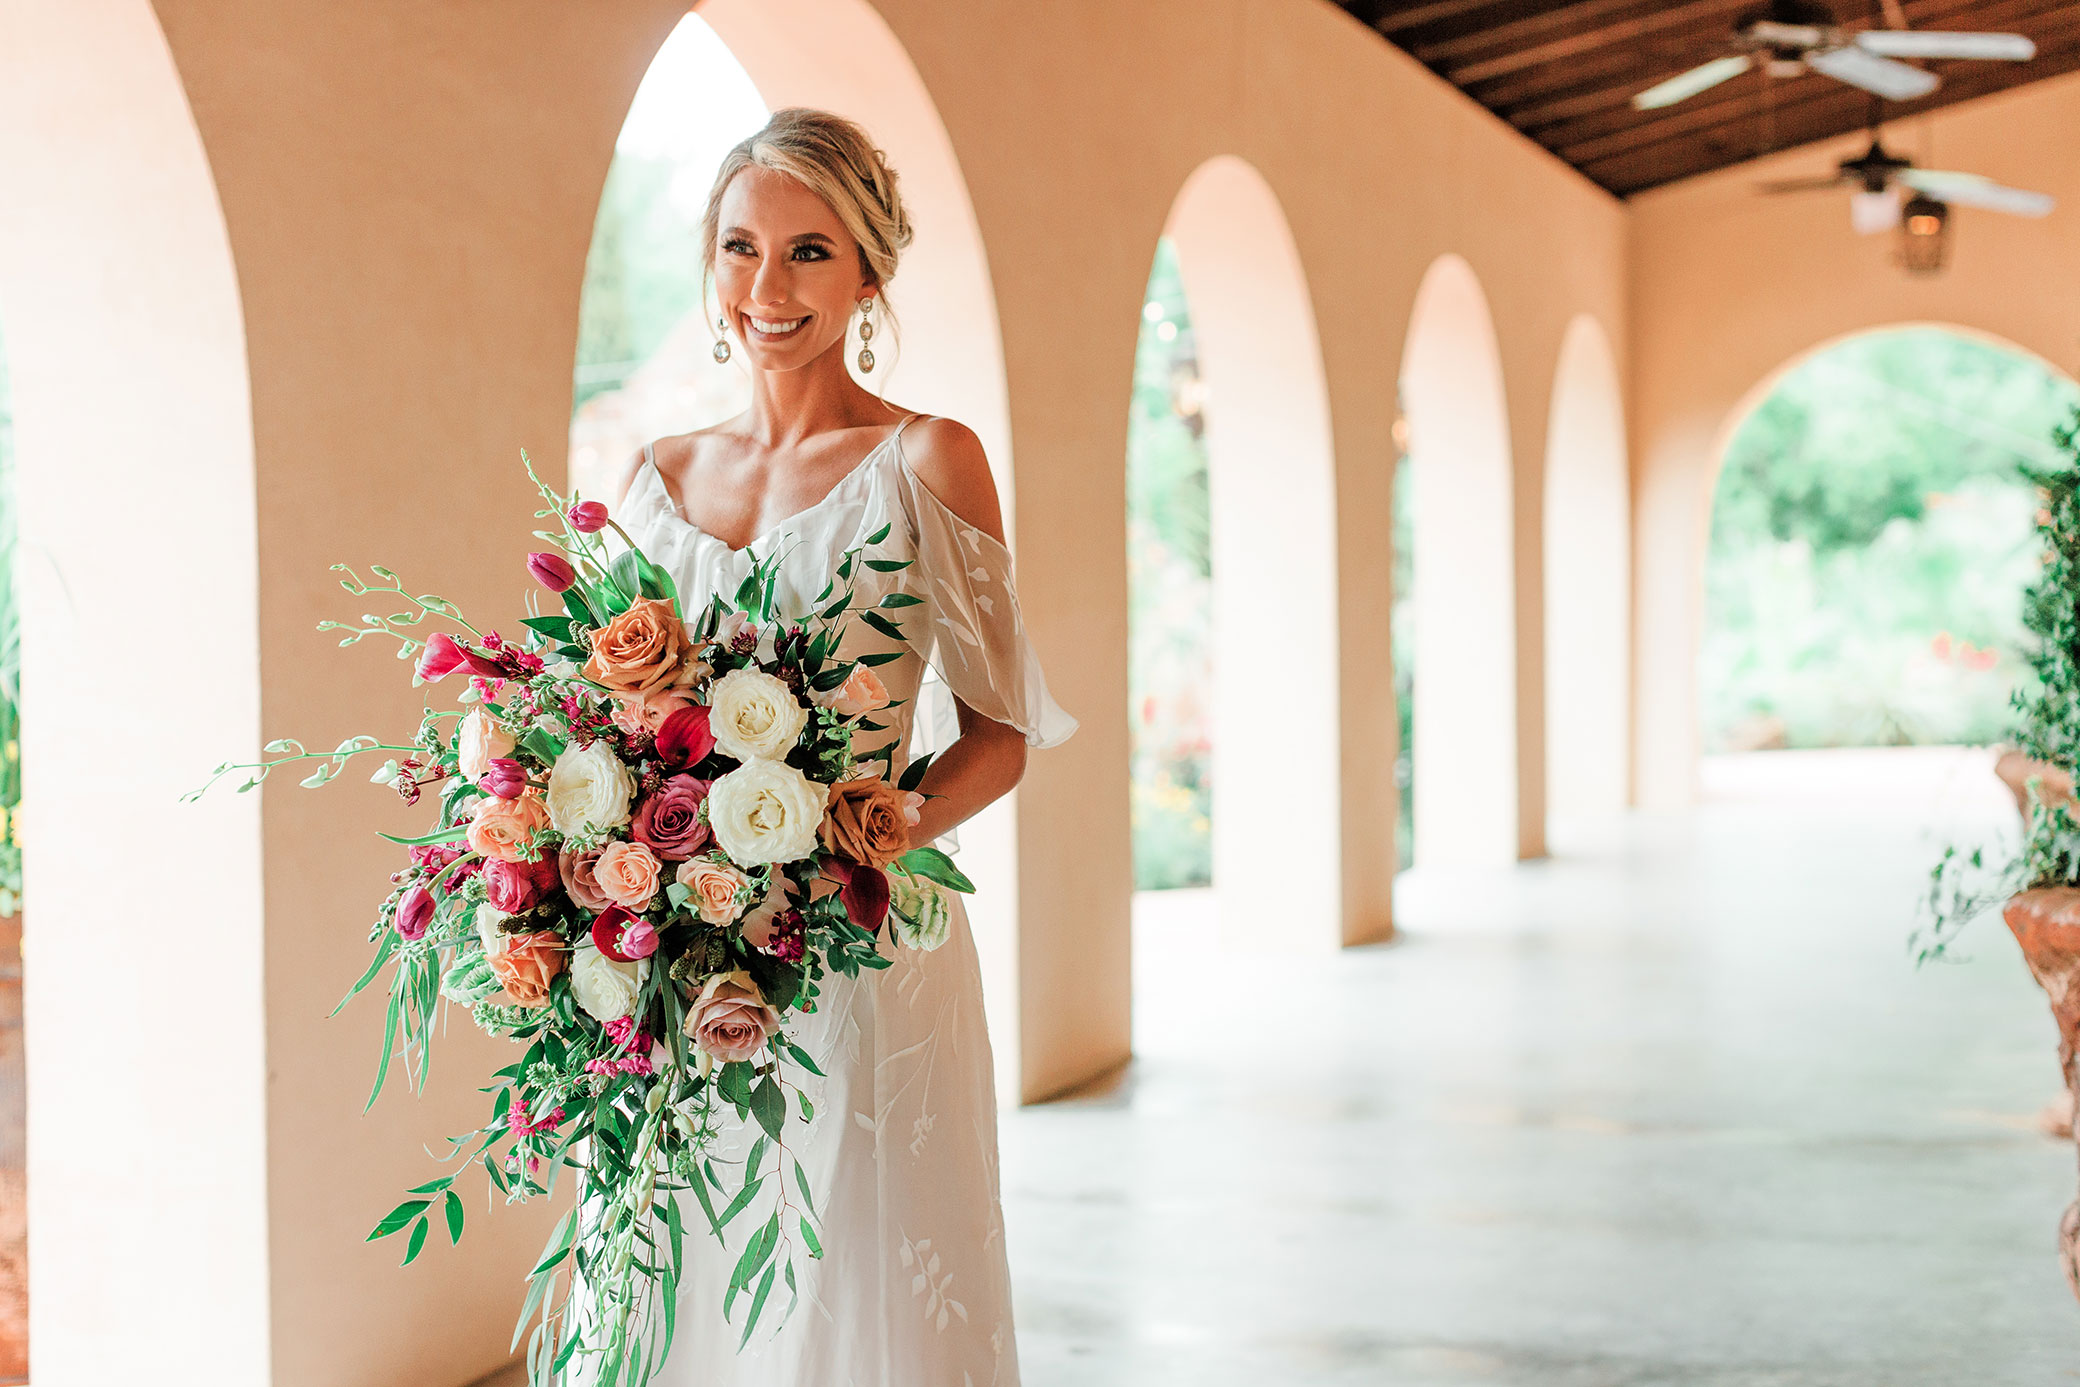 Madera_Estates_Texas_Wedding_Styled_Shoot_0125.jpg